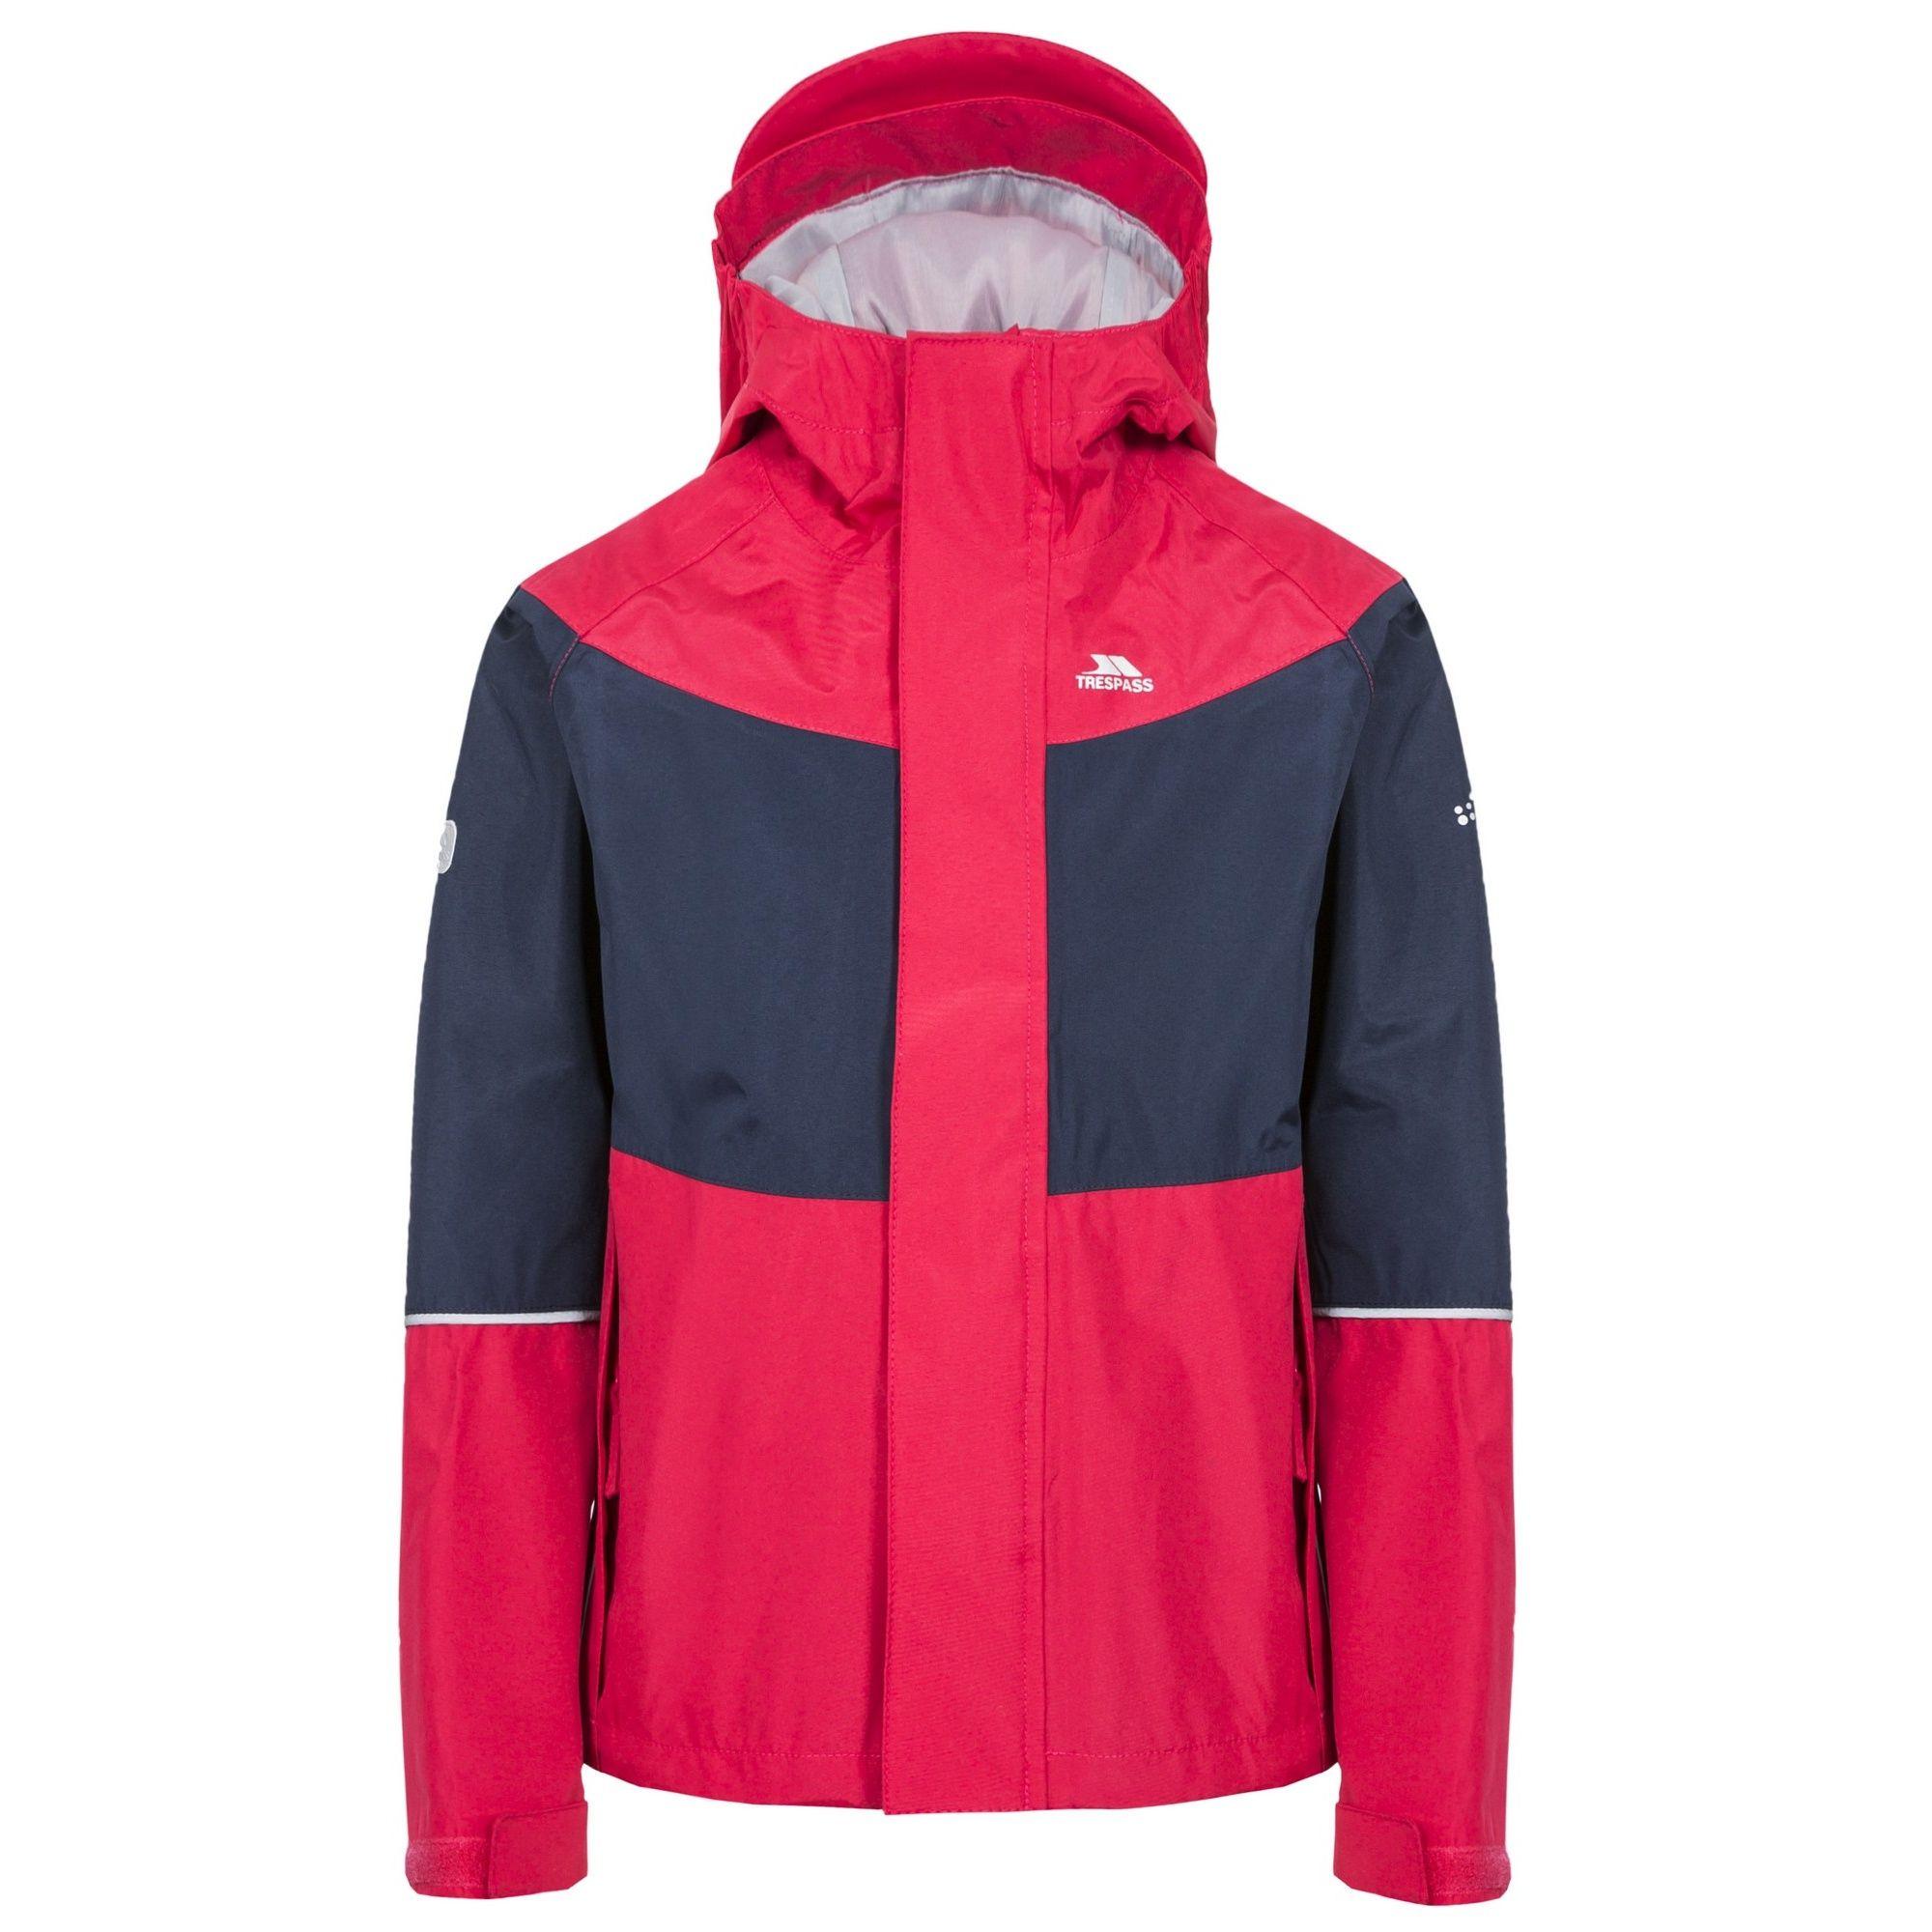 Trespass Childrens/Kids Ossie Waterproof Jacket